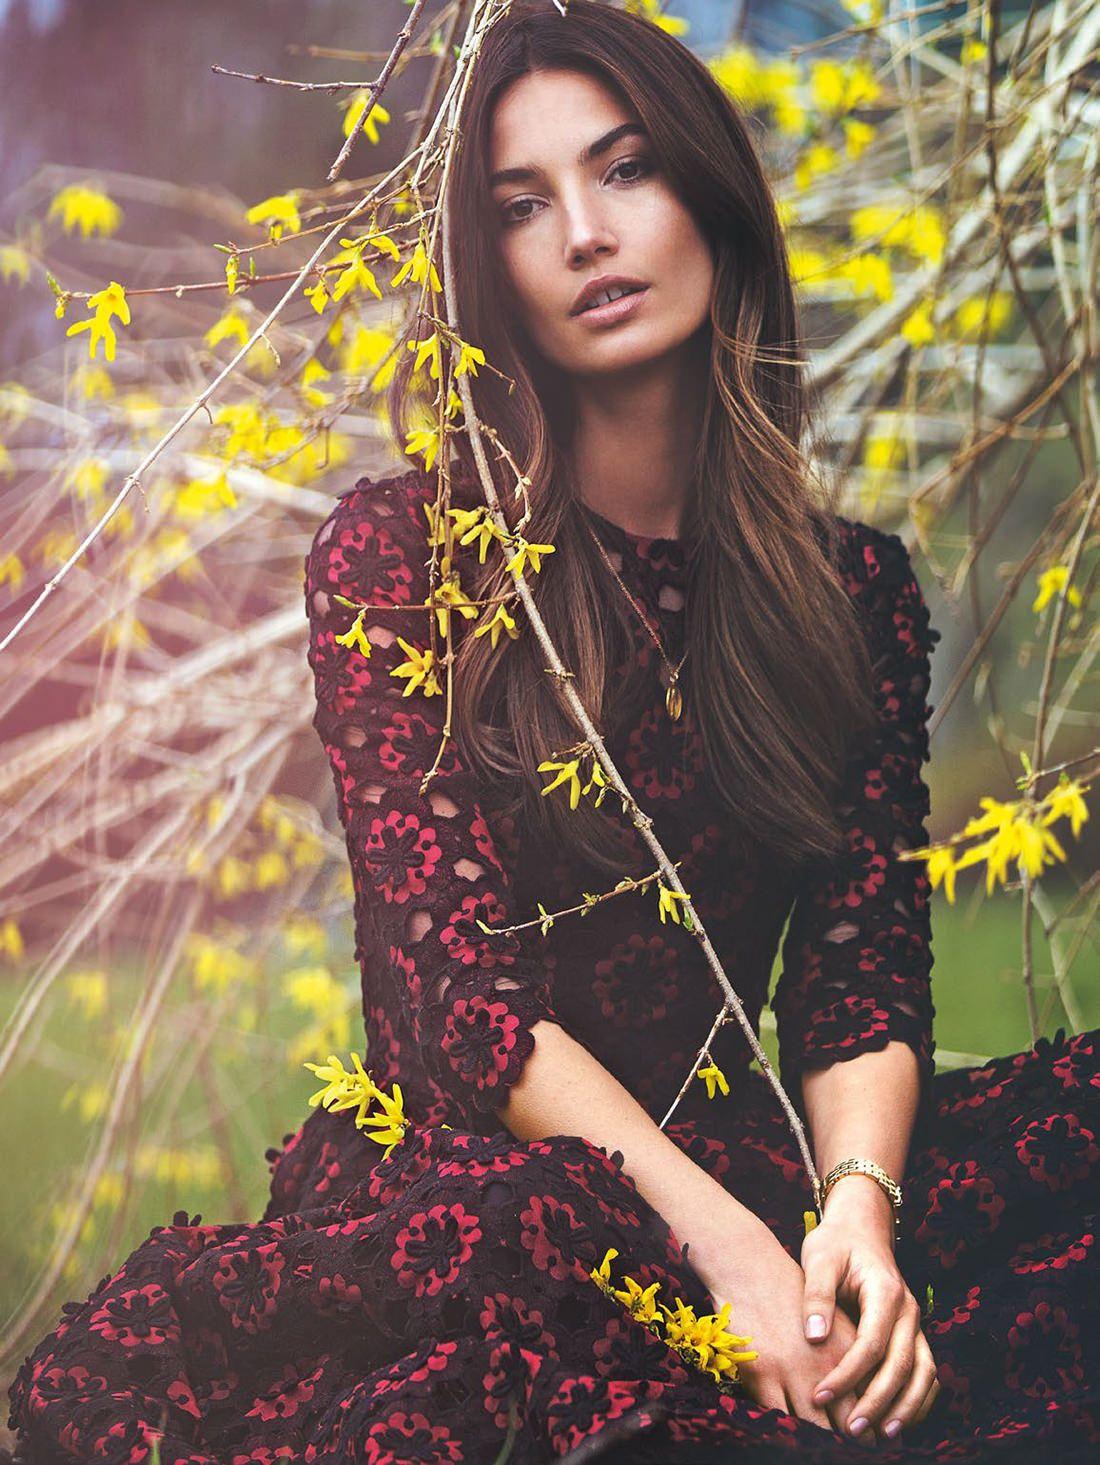 Lily Aldridge for VEGAS Magazine December 2010 - Fashion